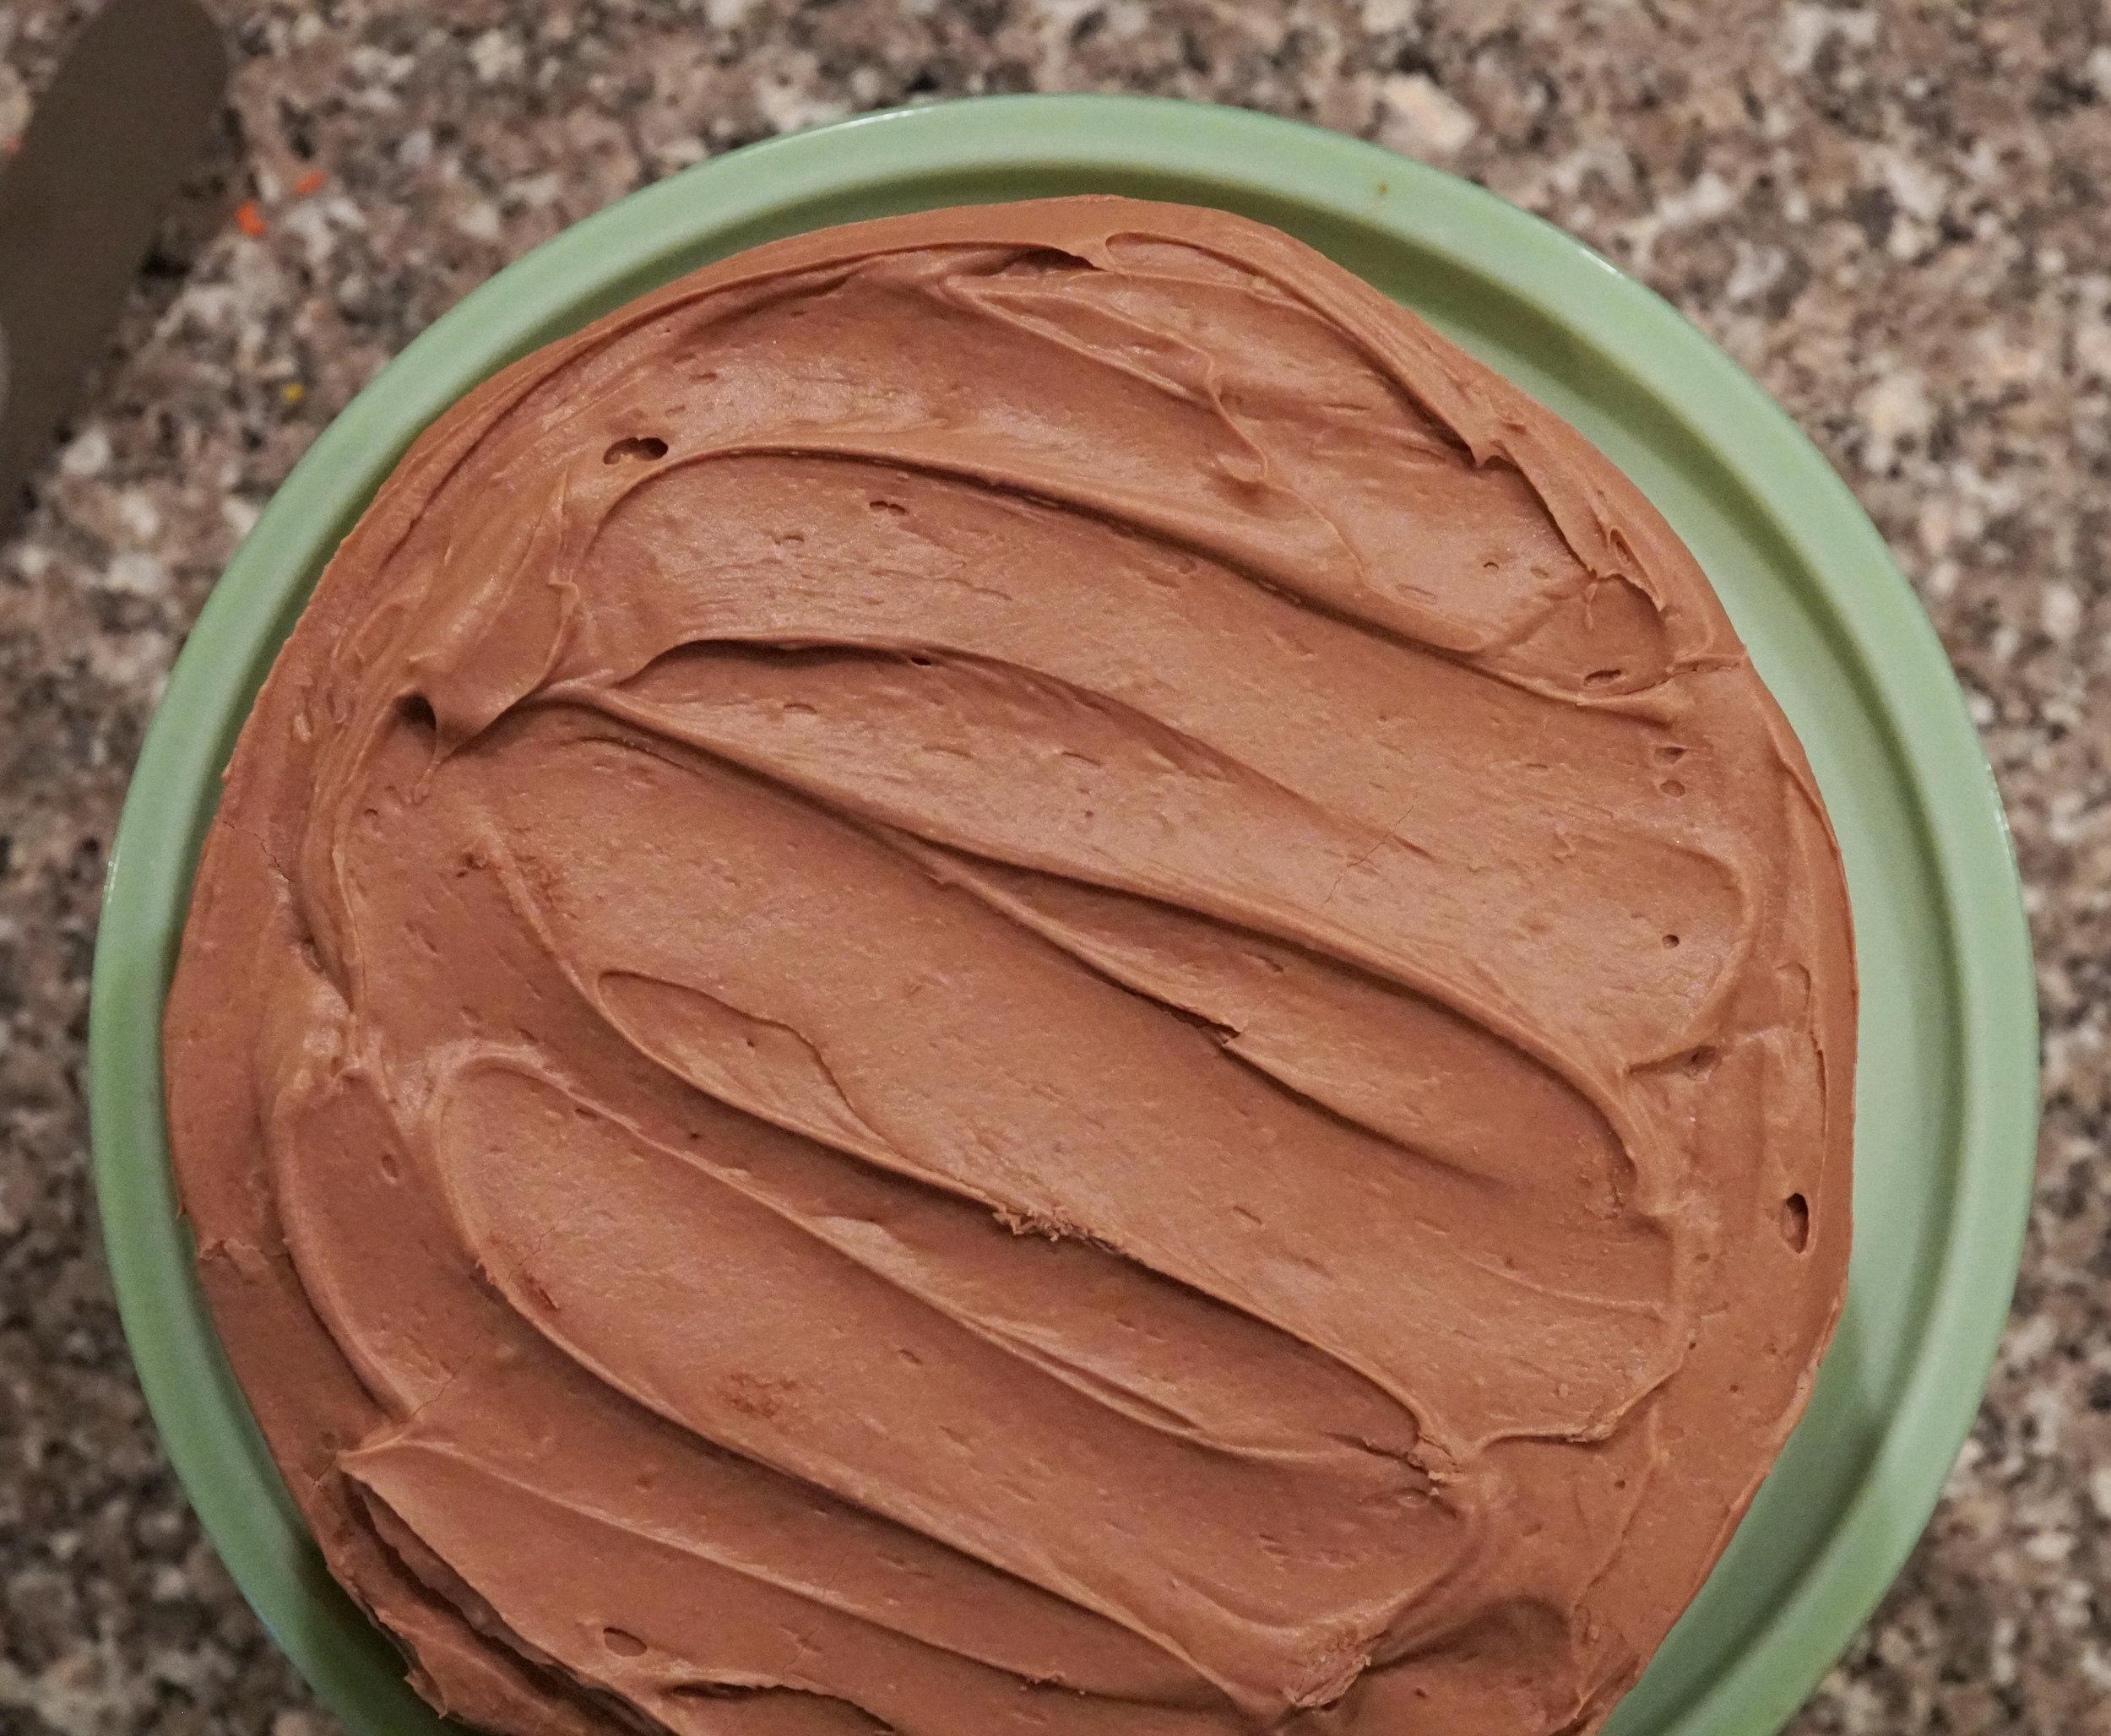 Chocoalte and Cream Cheese Frosting I.jpg